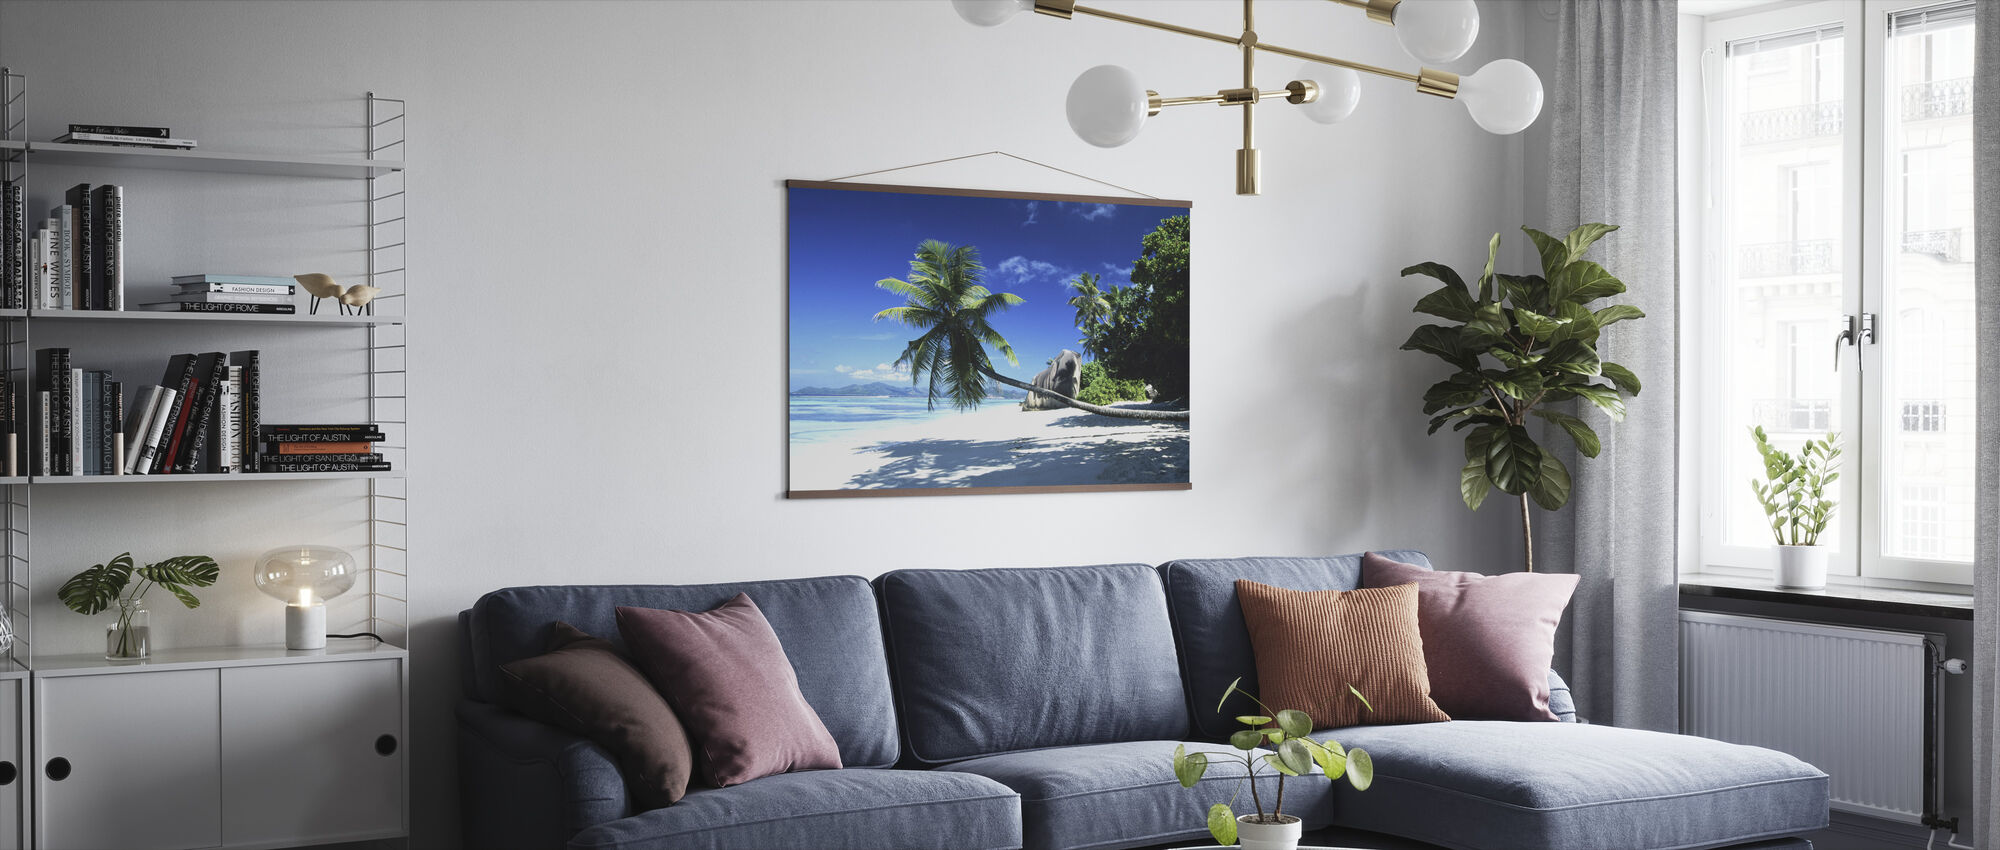 Paradis - Plakat - Stue